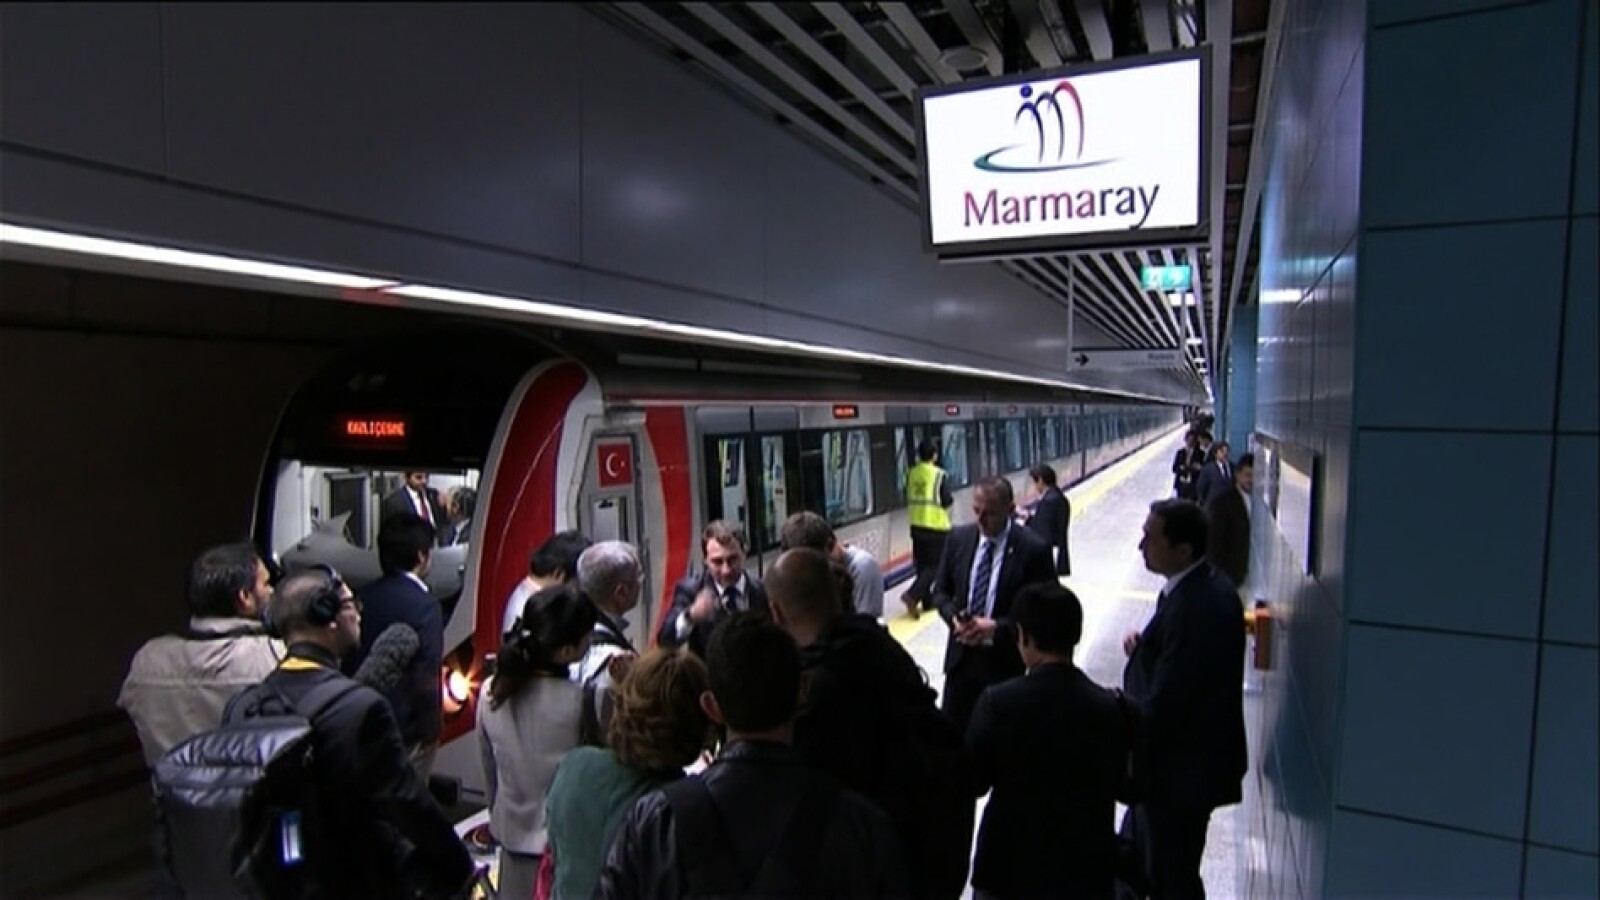 Marmaray tren Turquía 4